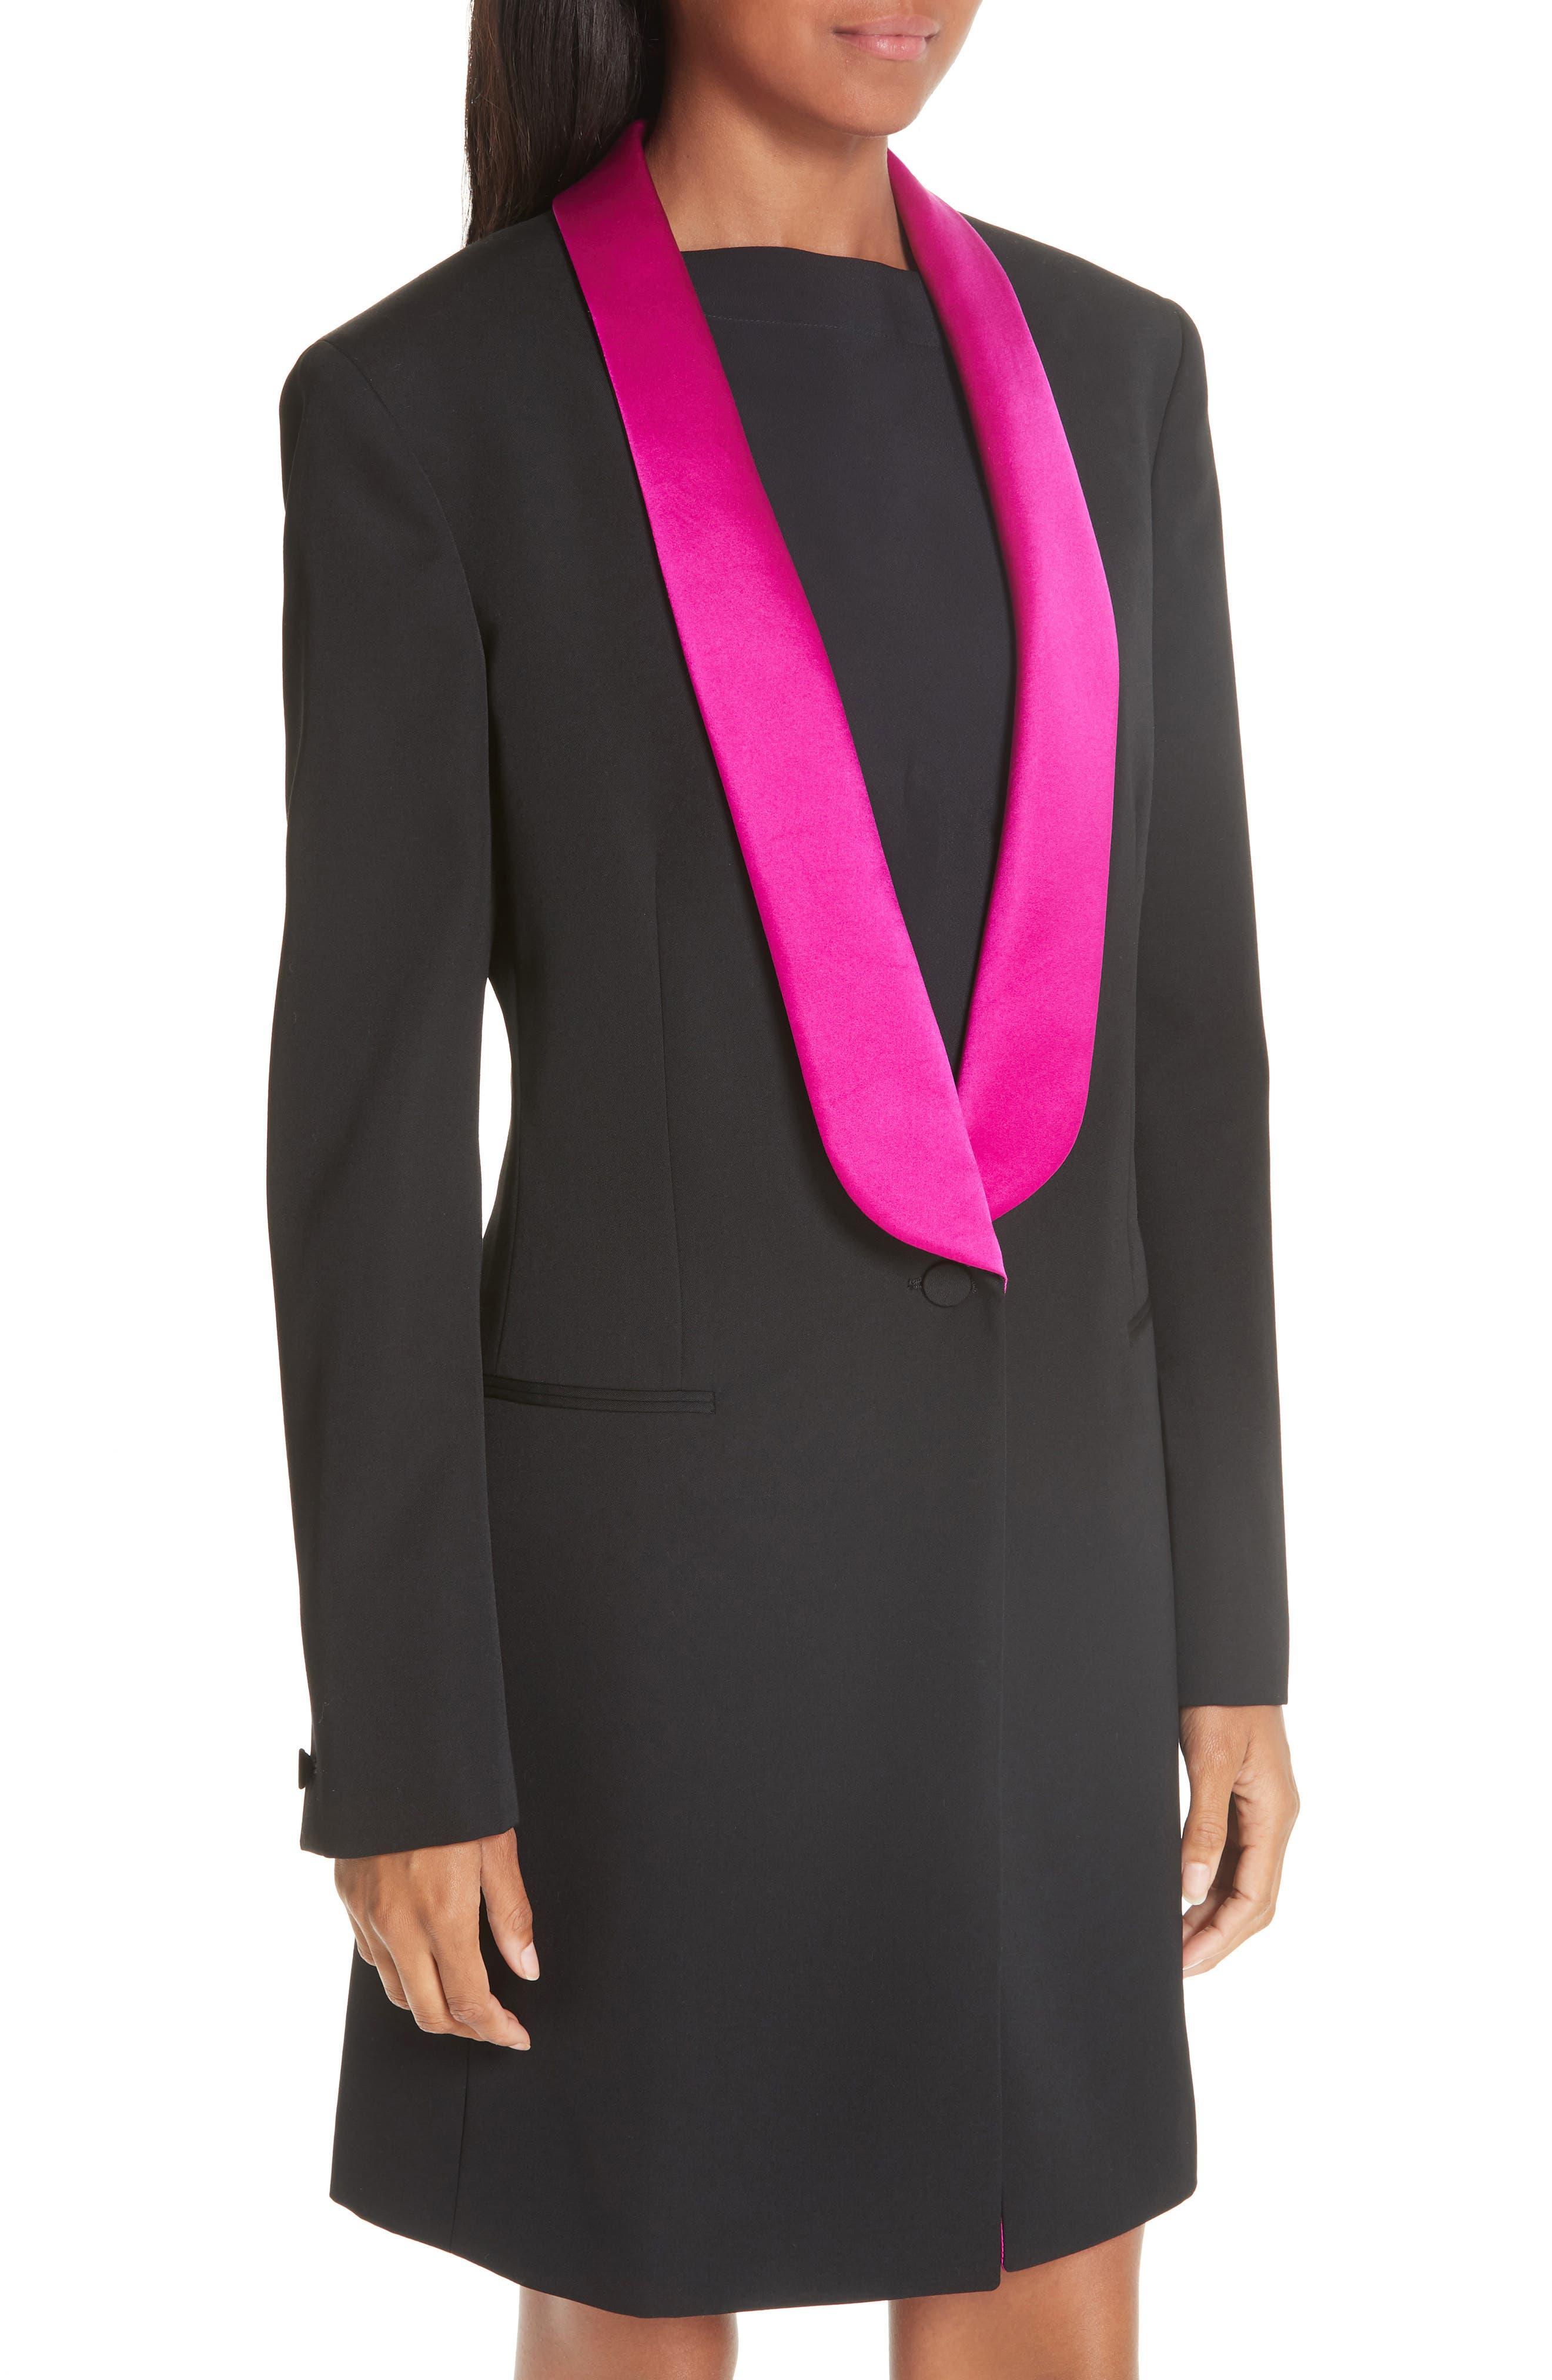 CALVIN KLEIN 205W39NYC, Contrast Lapel Wool Gabardine Jacket, Alternate thumbnail 5, color, BLACK DARK ORCHID